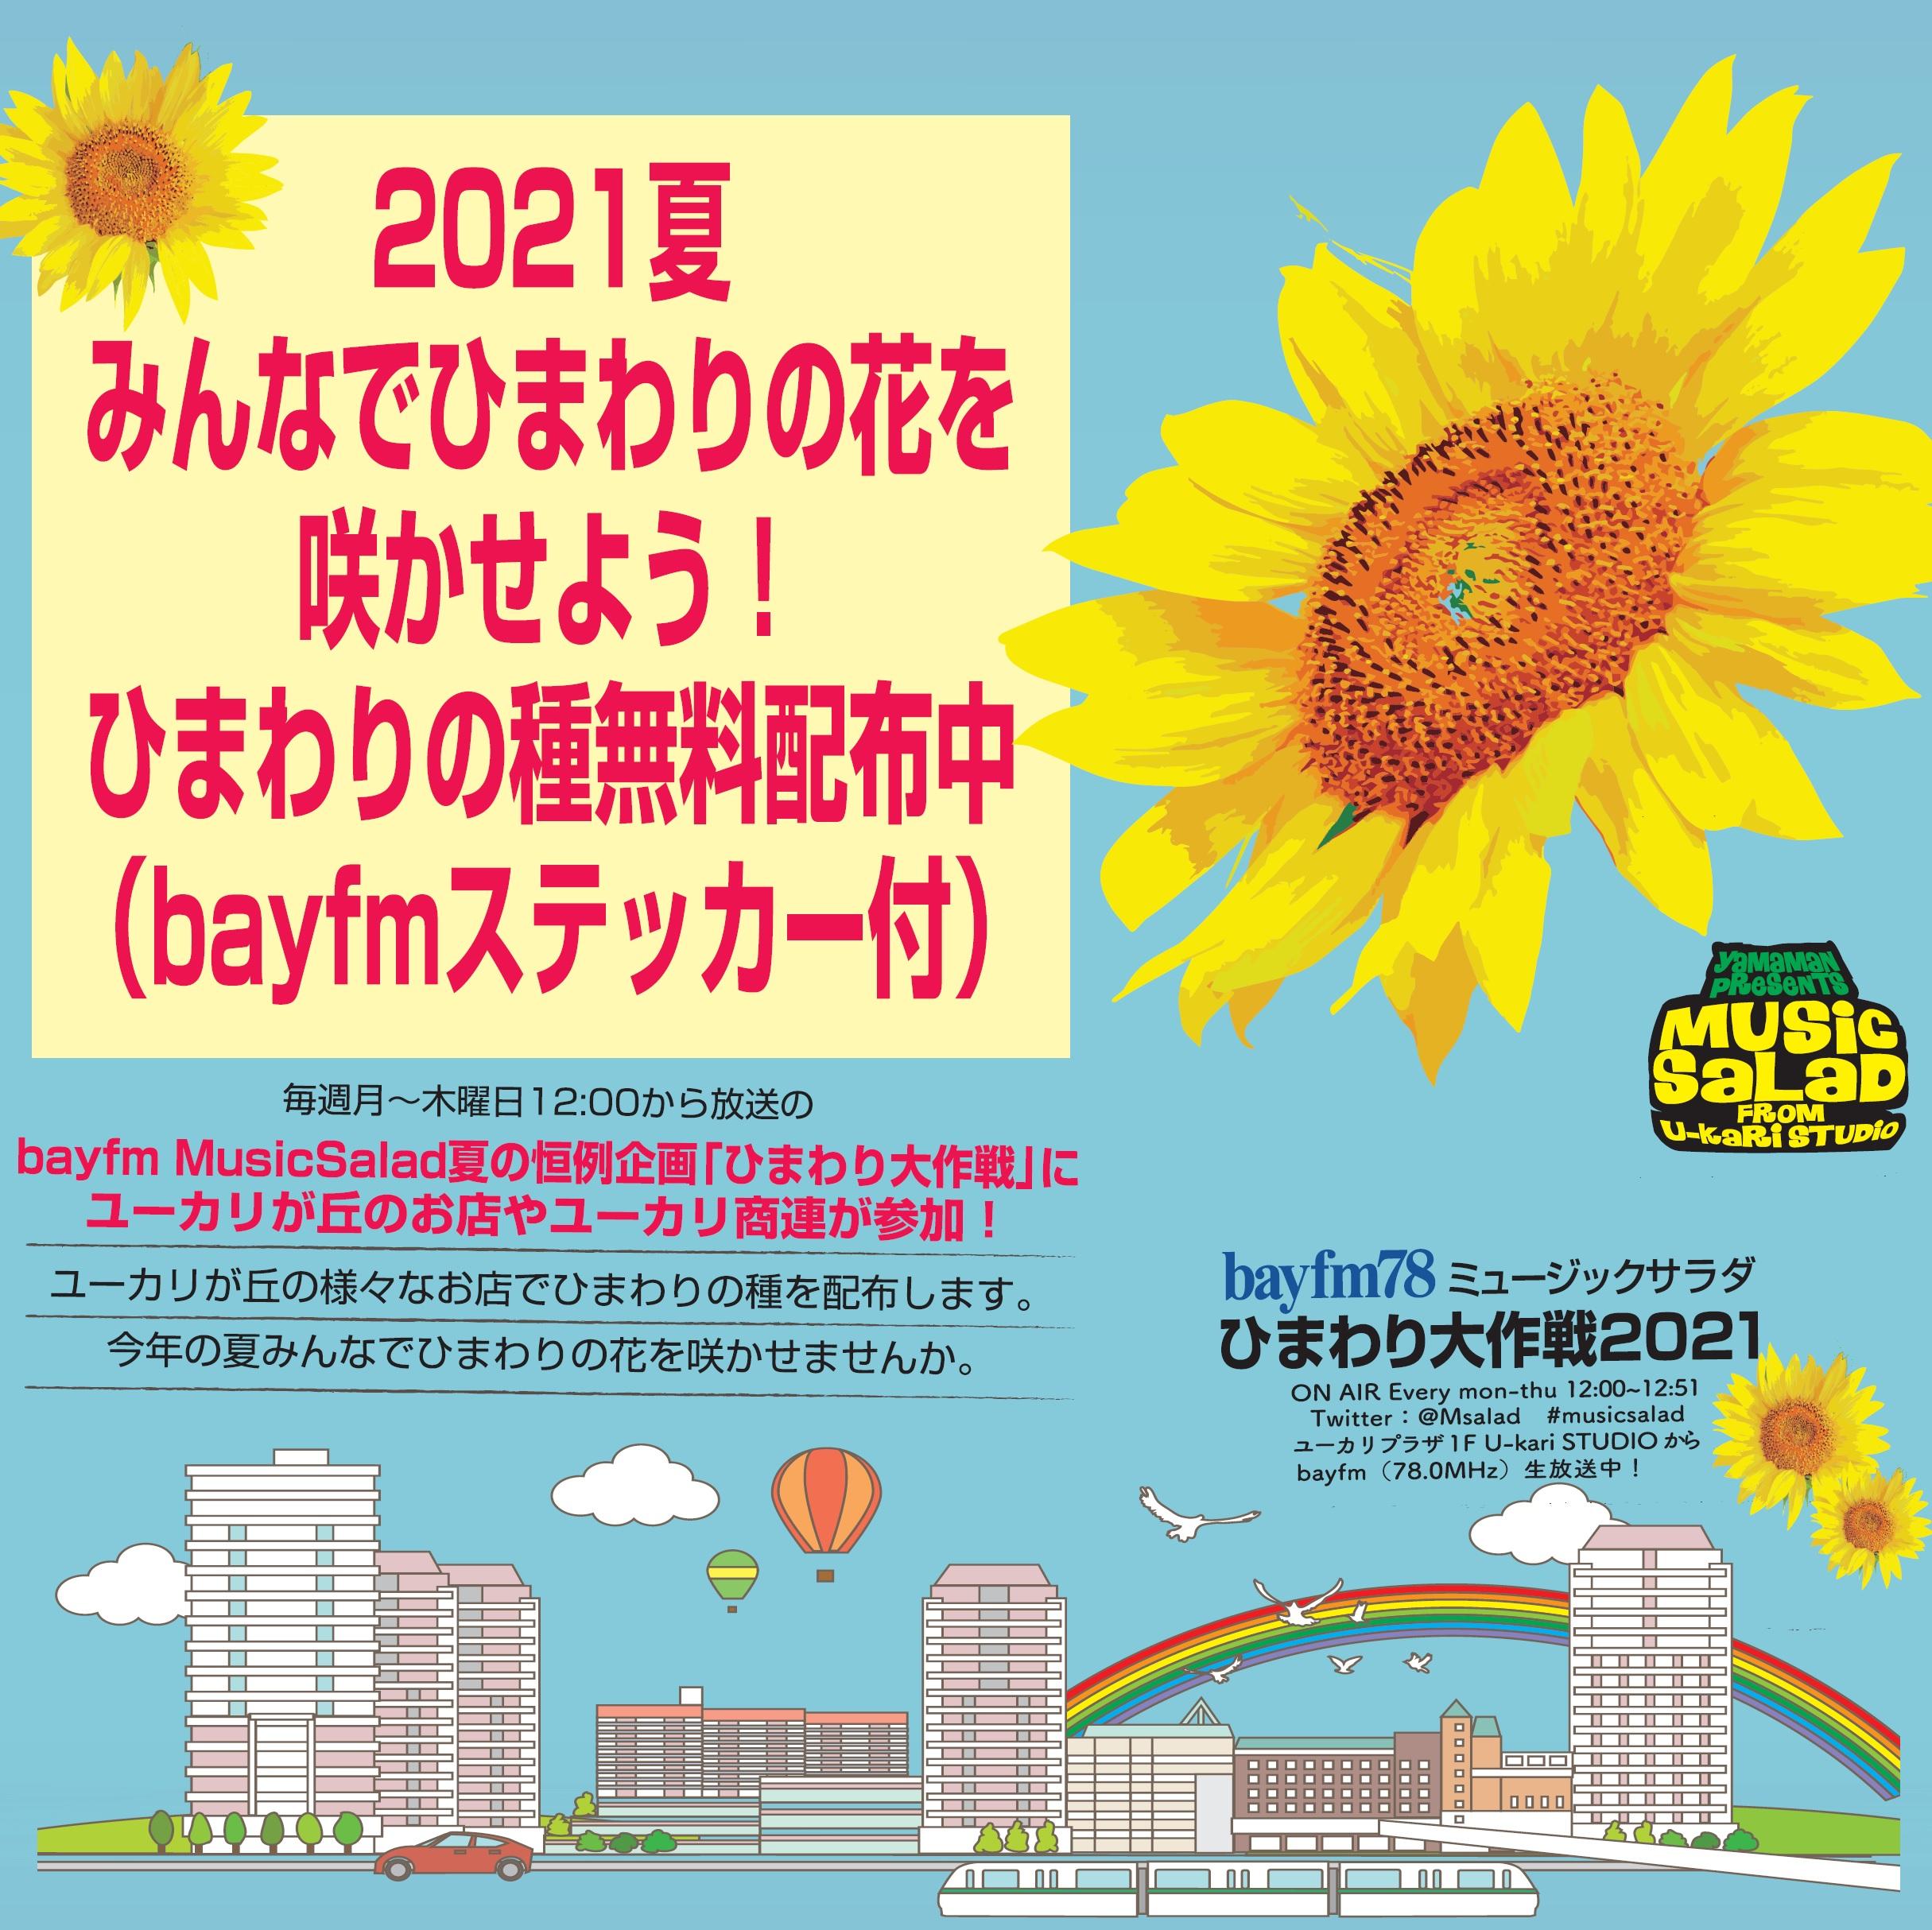 bayfm Music Salad「エアージョイントひまわり大作戦2021」開催!